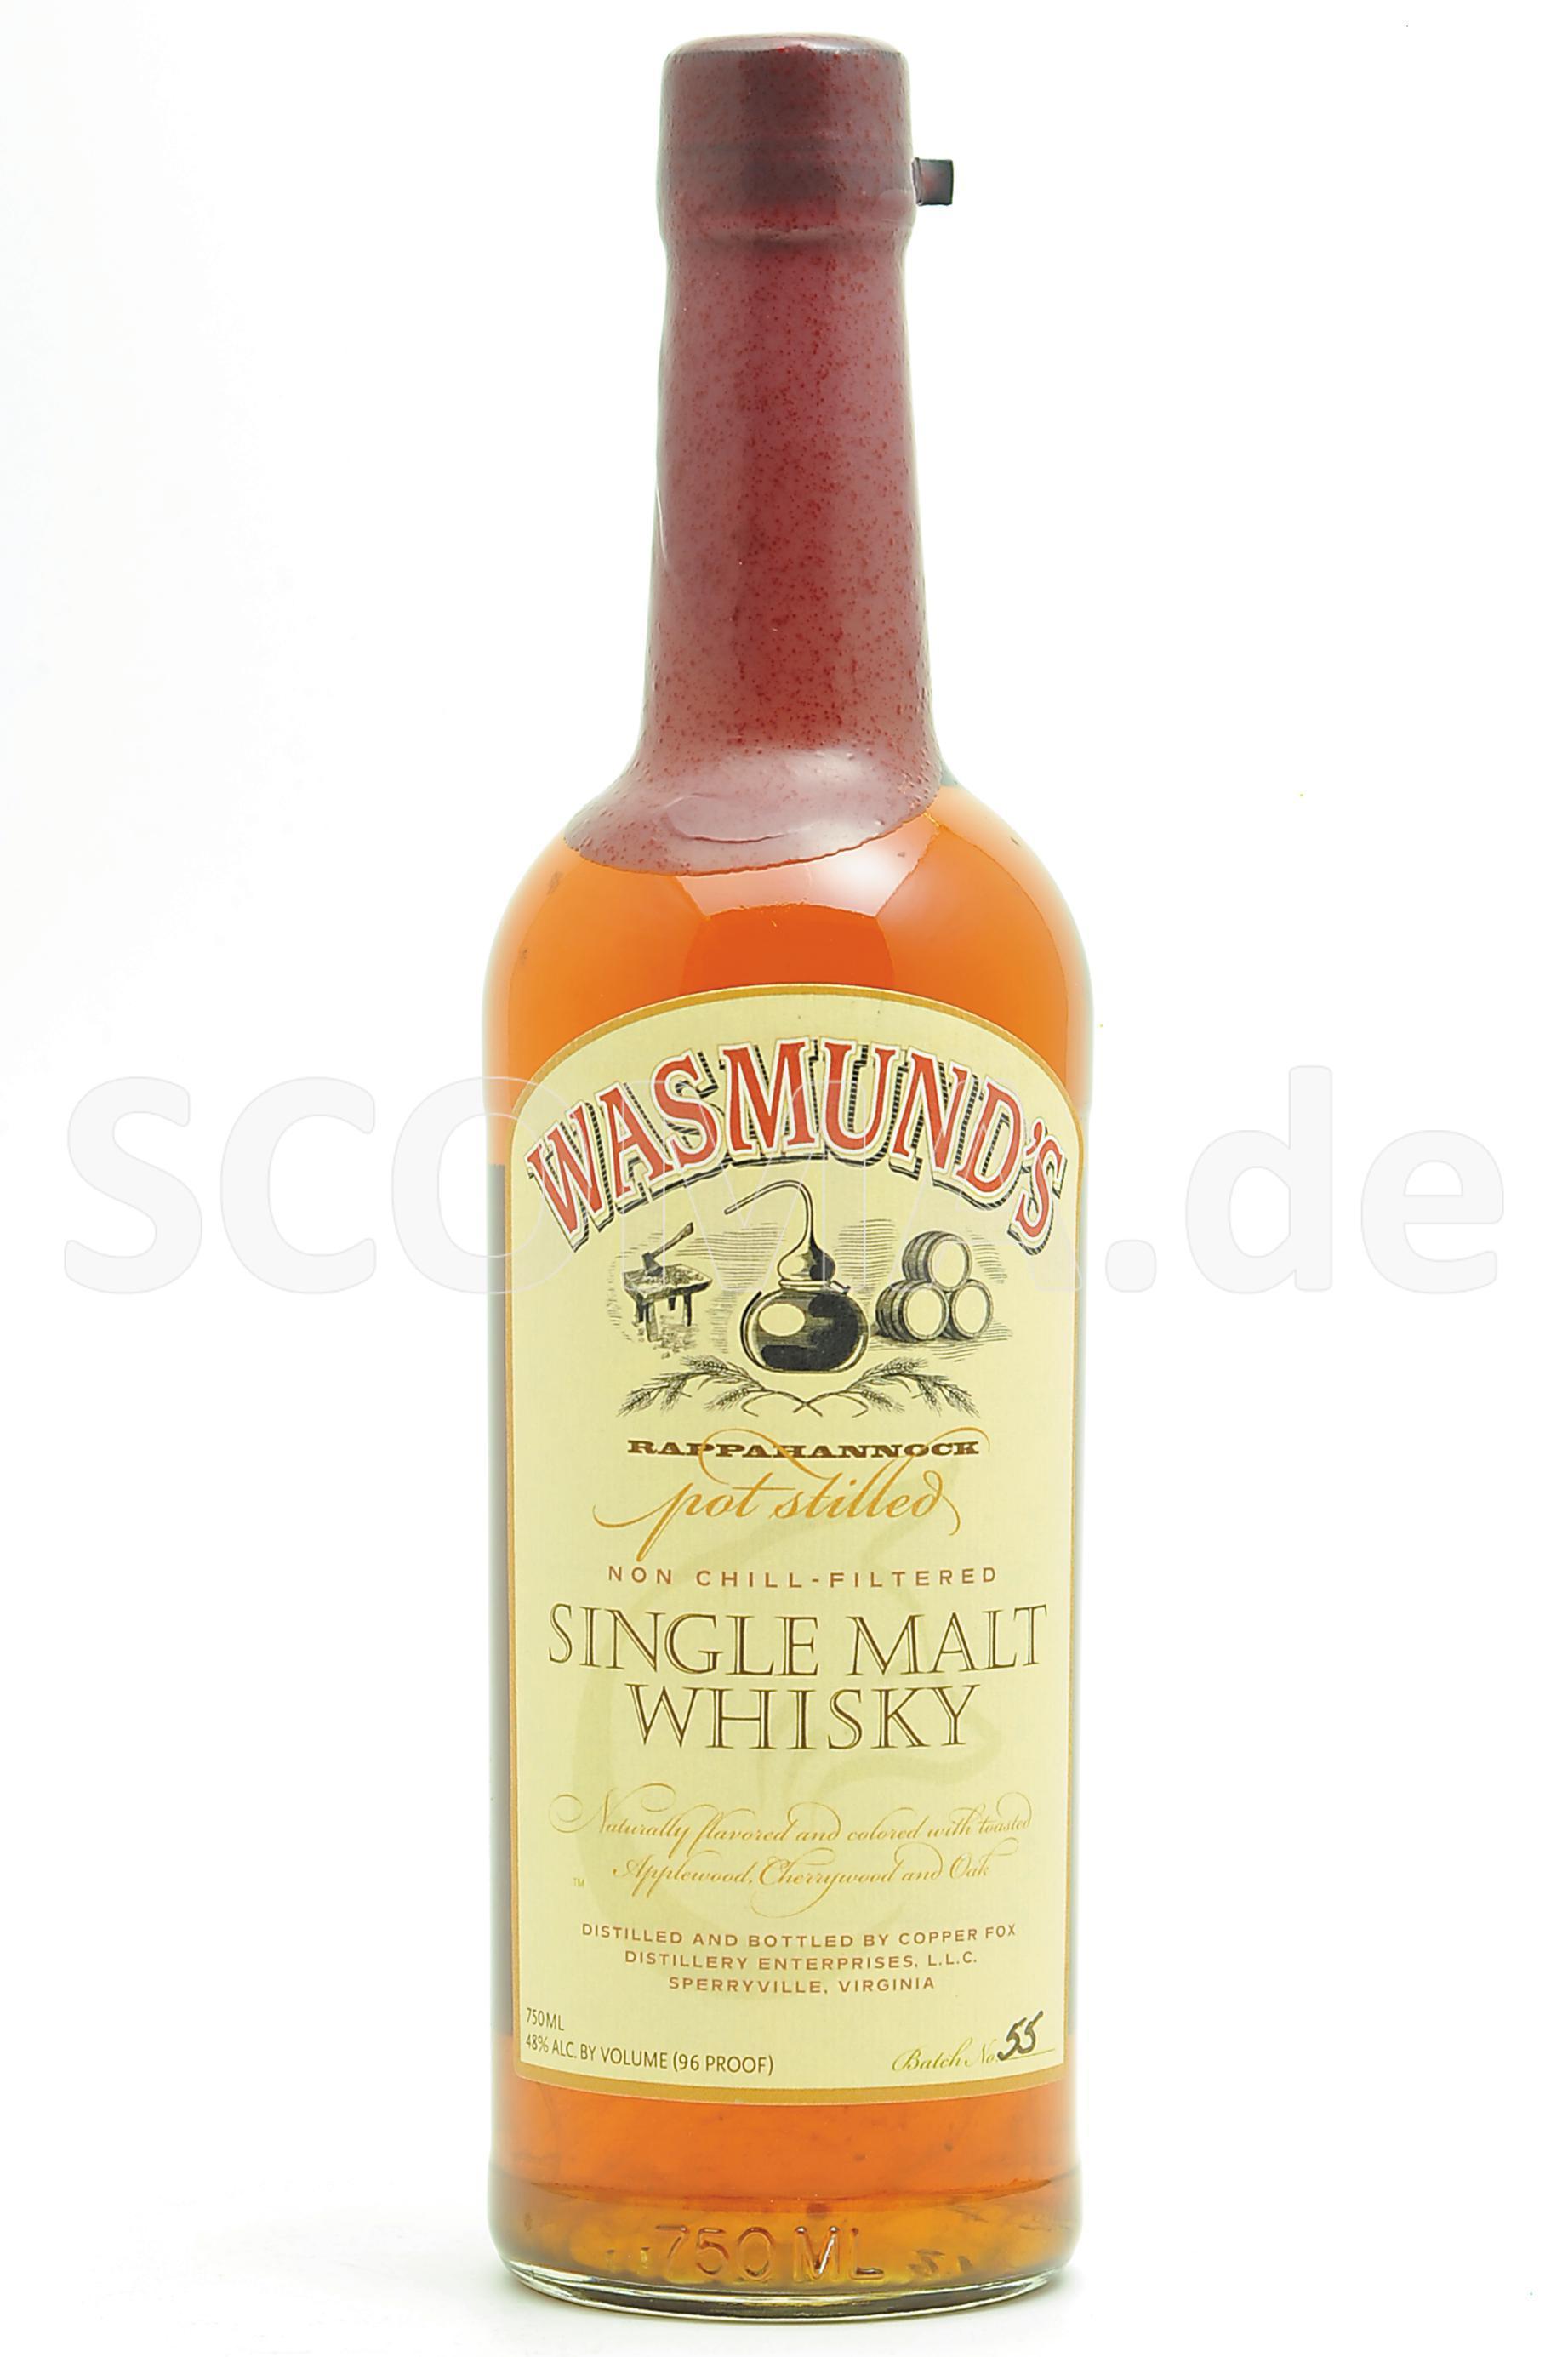 Wasmund's Single Malt Whiskey